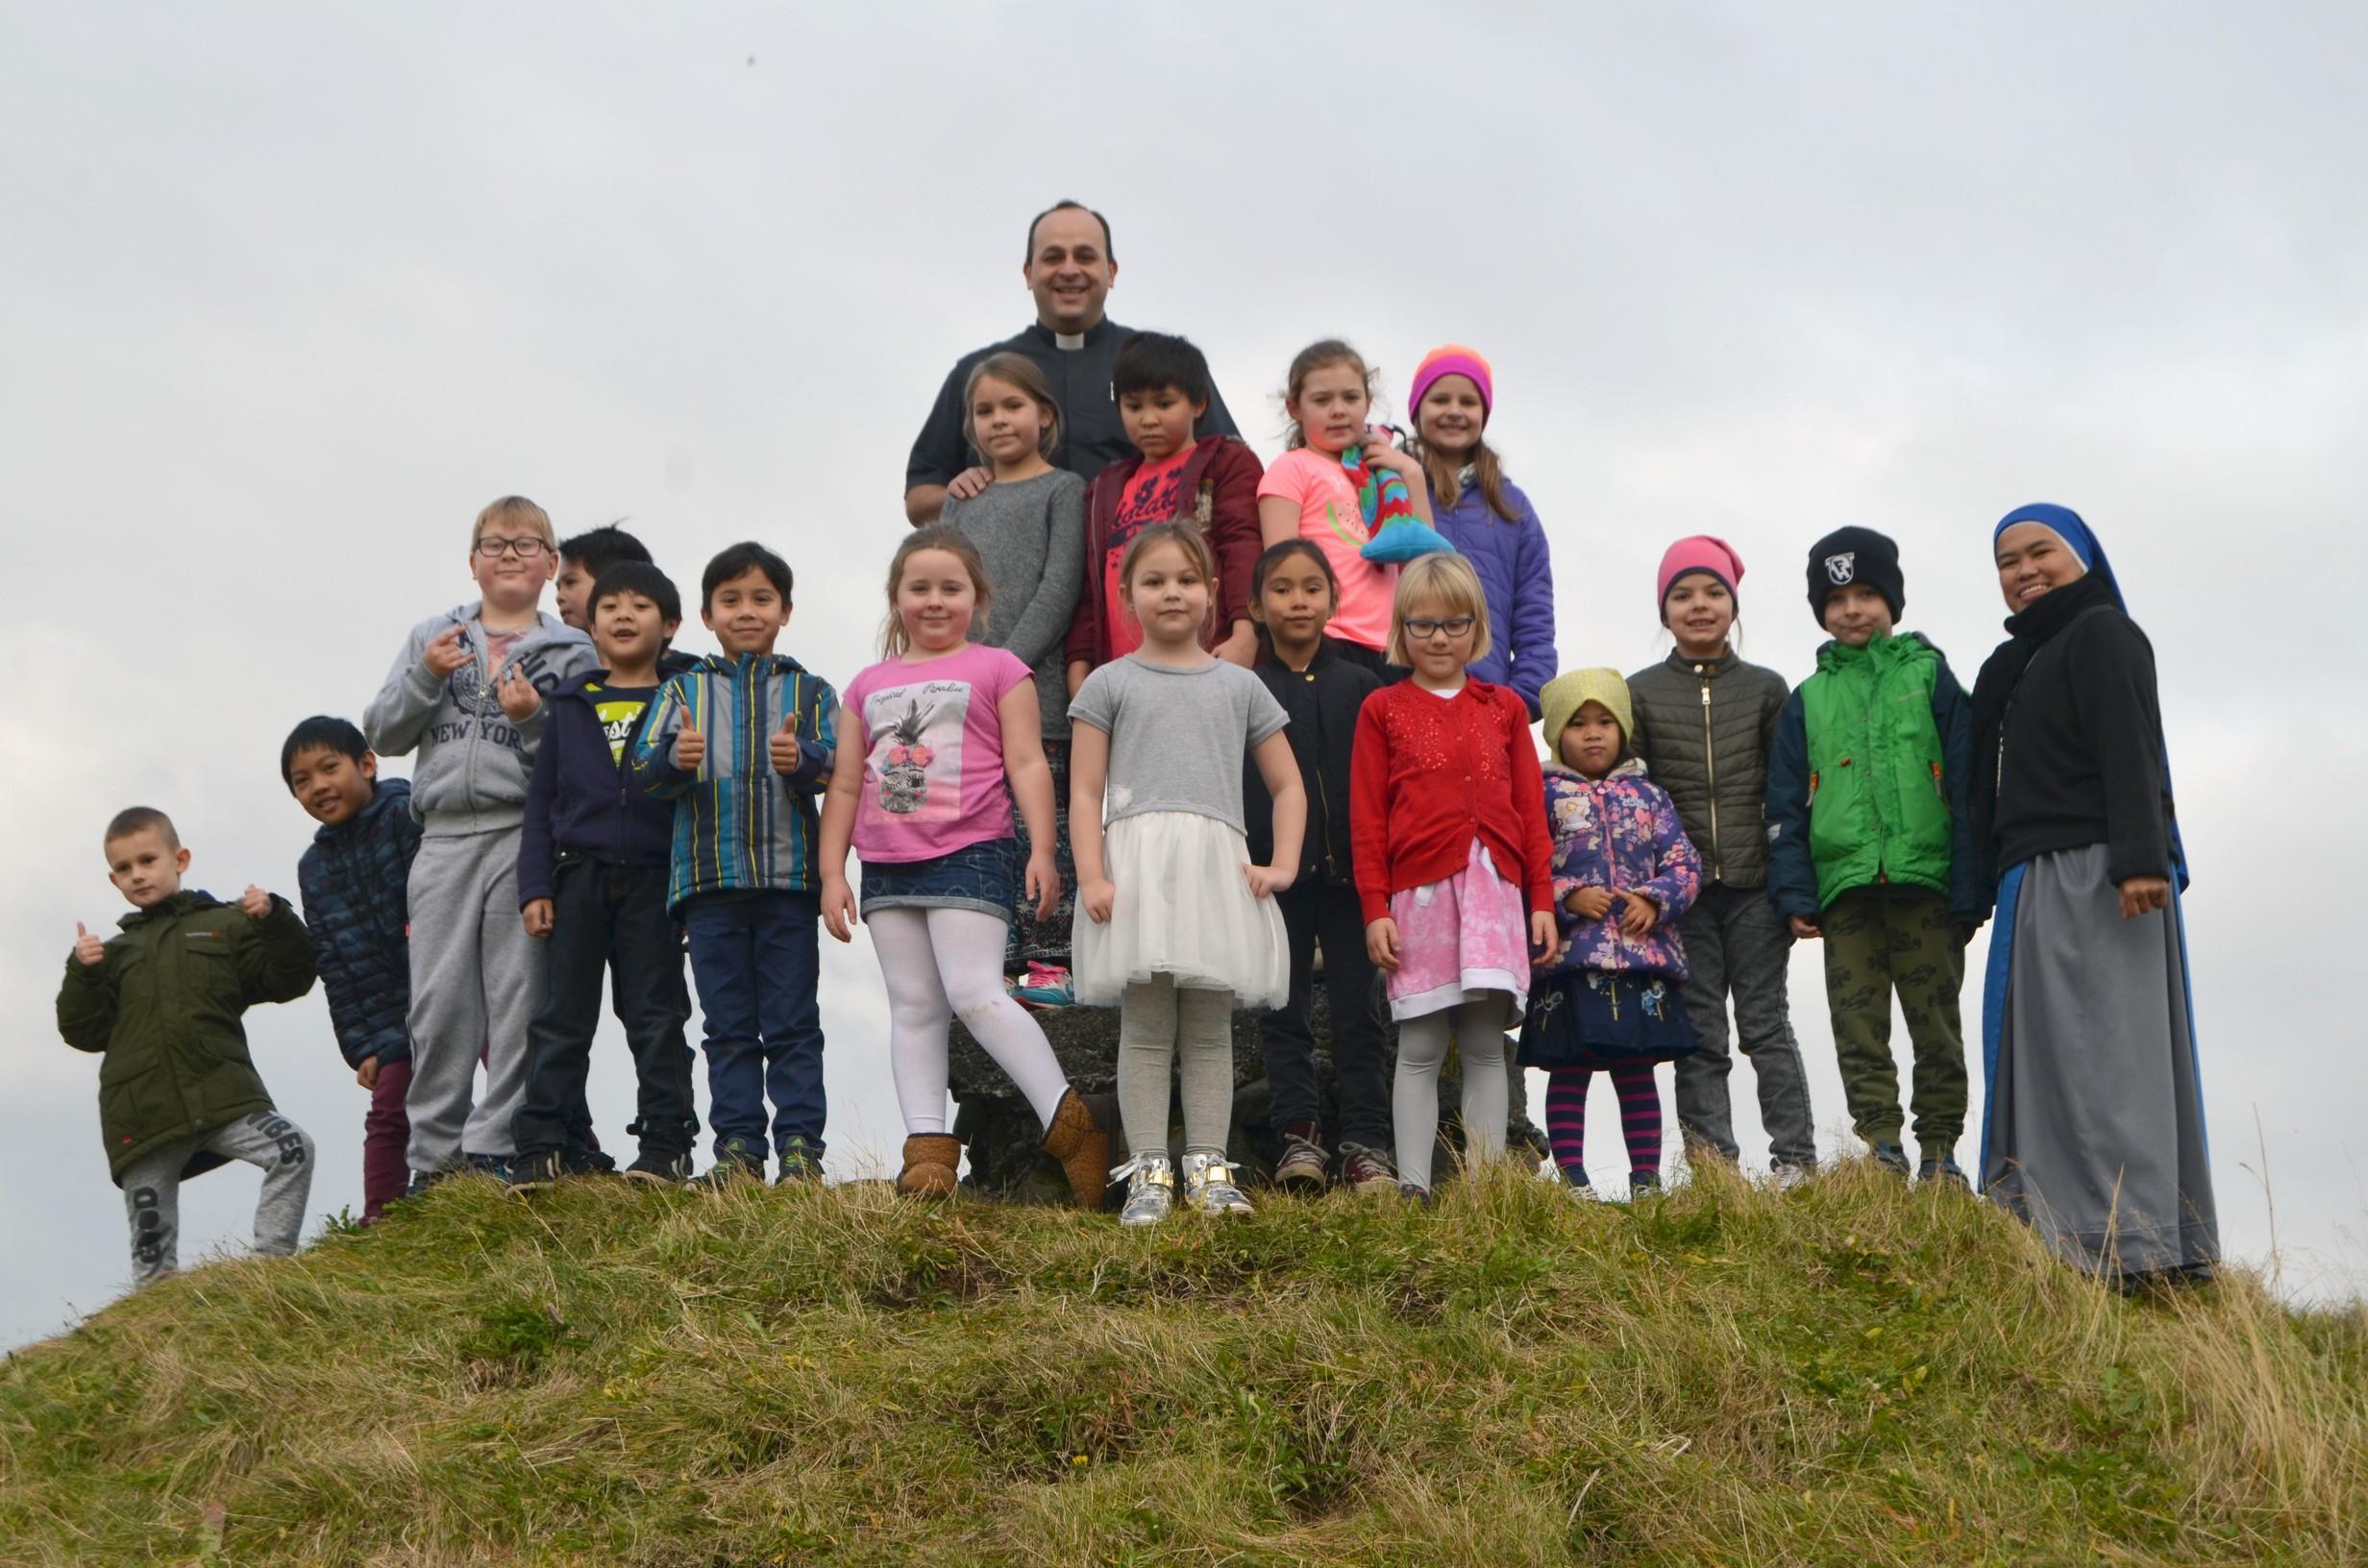 IVE-SSVM-Retreat-Comunion-kids-Iceland8